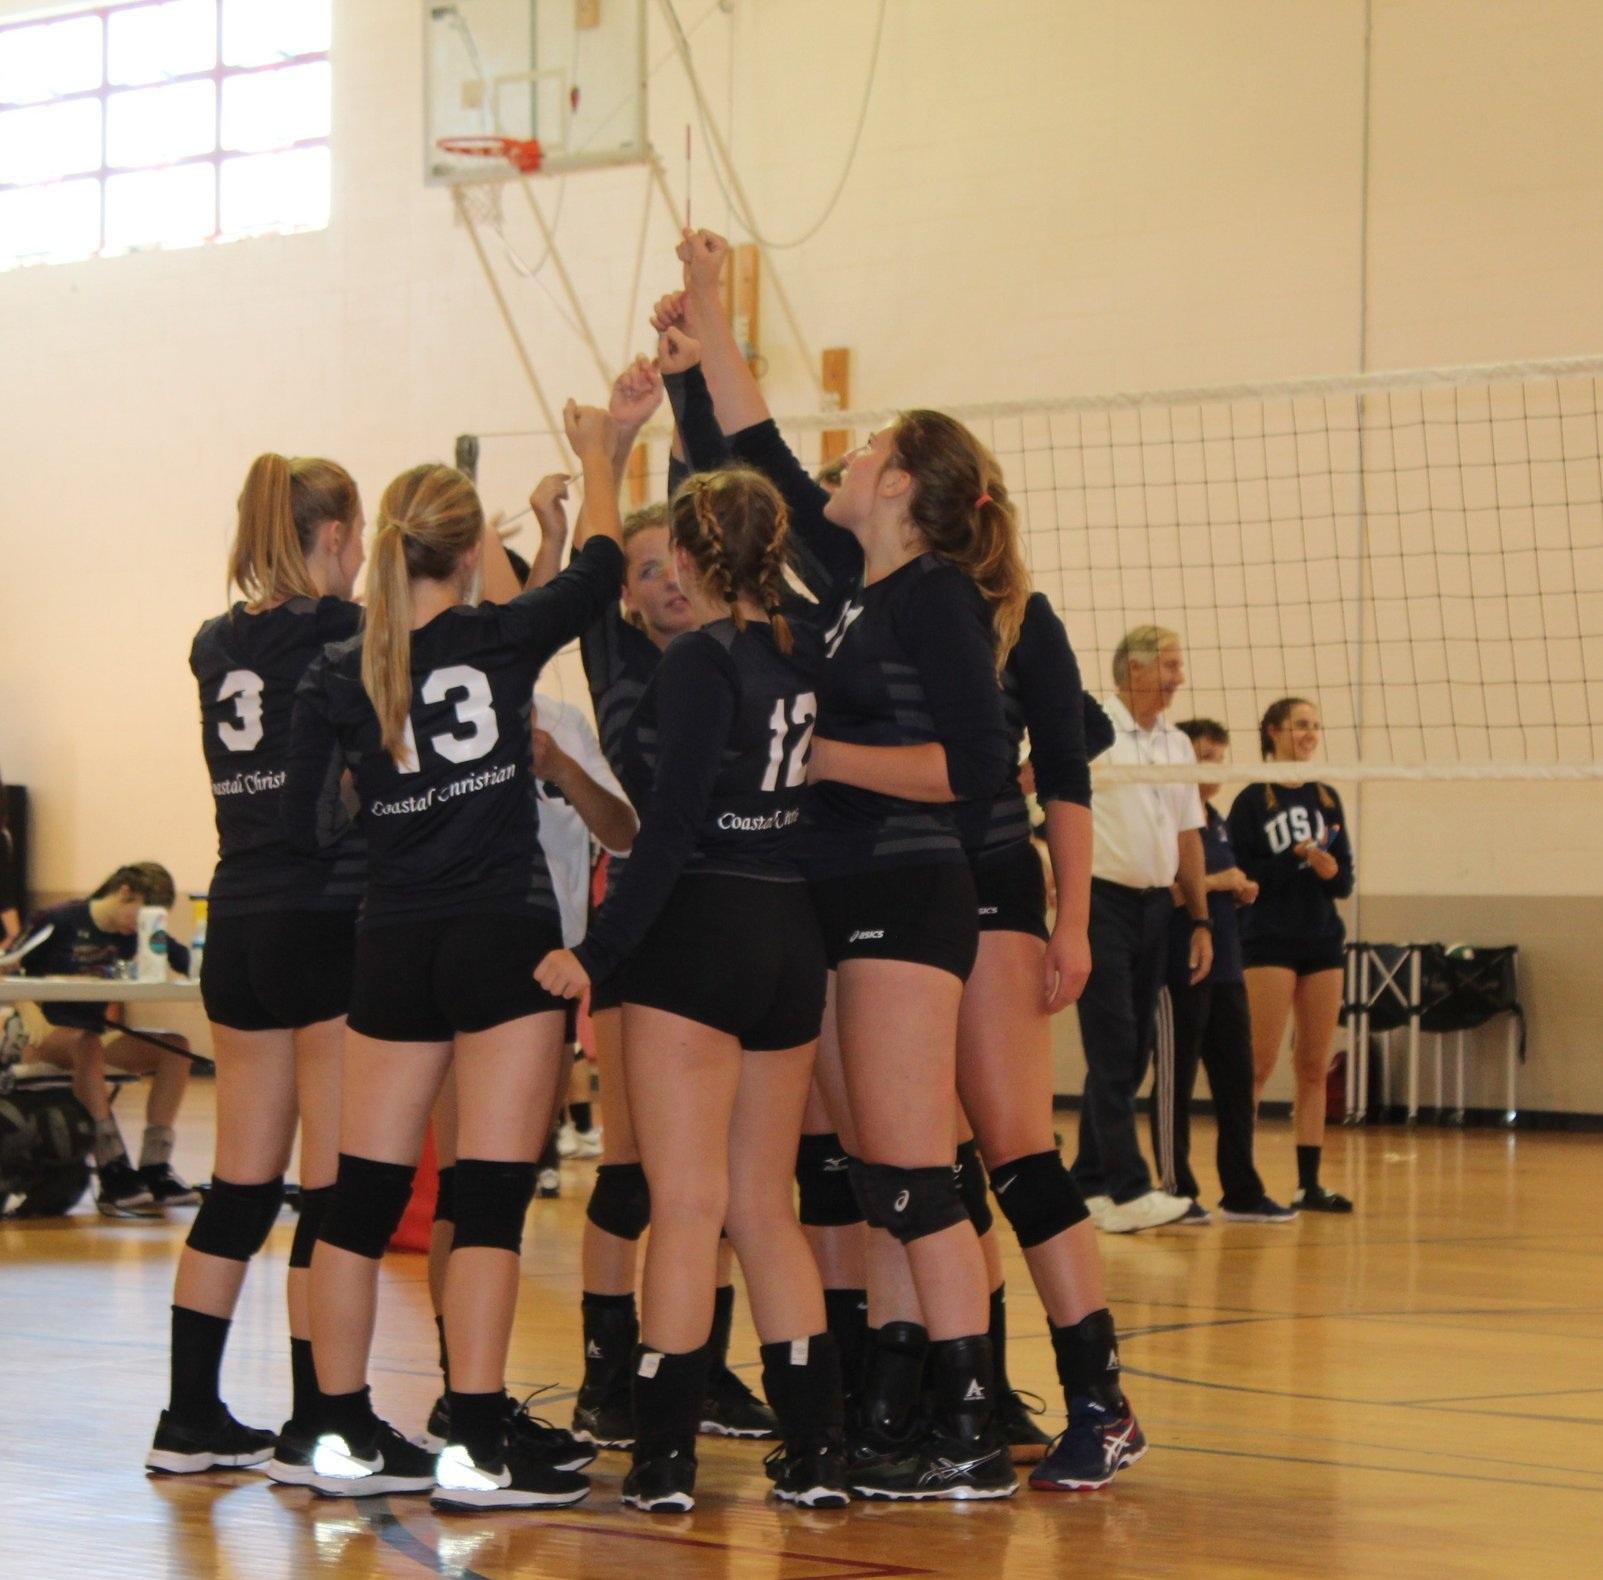 High School Volleyball Team Huddles